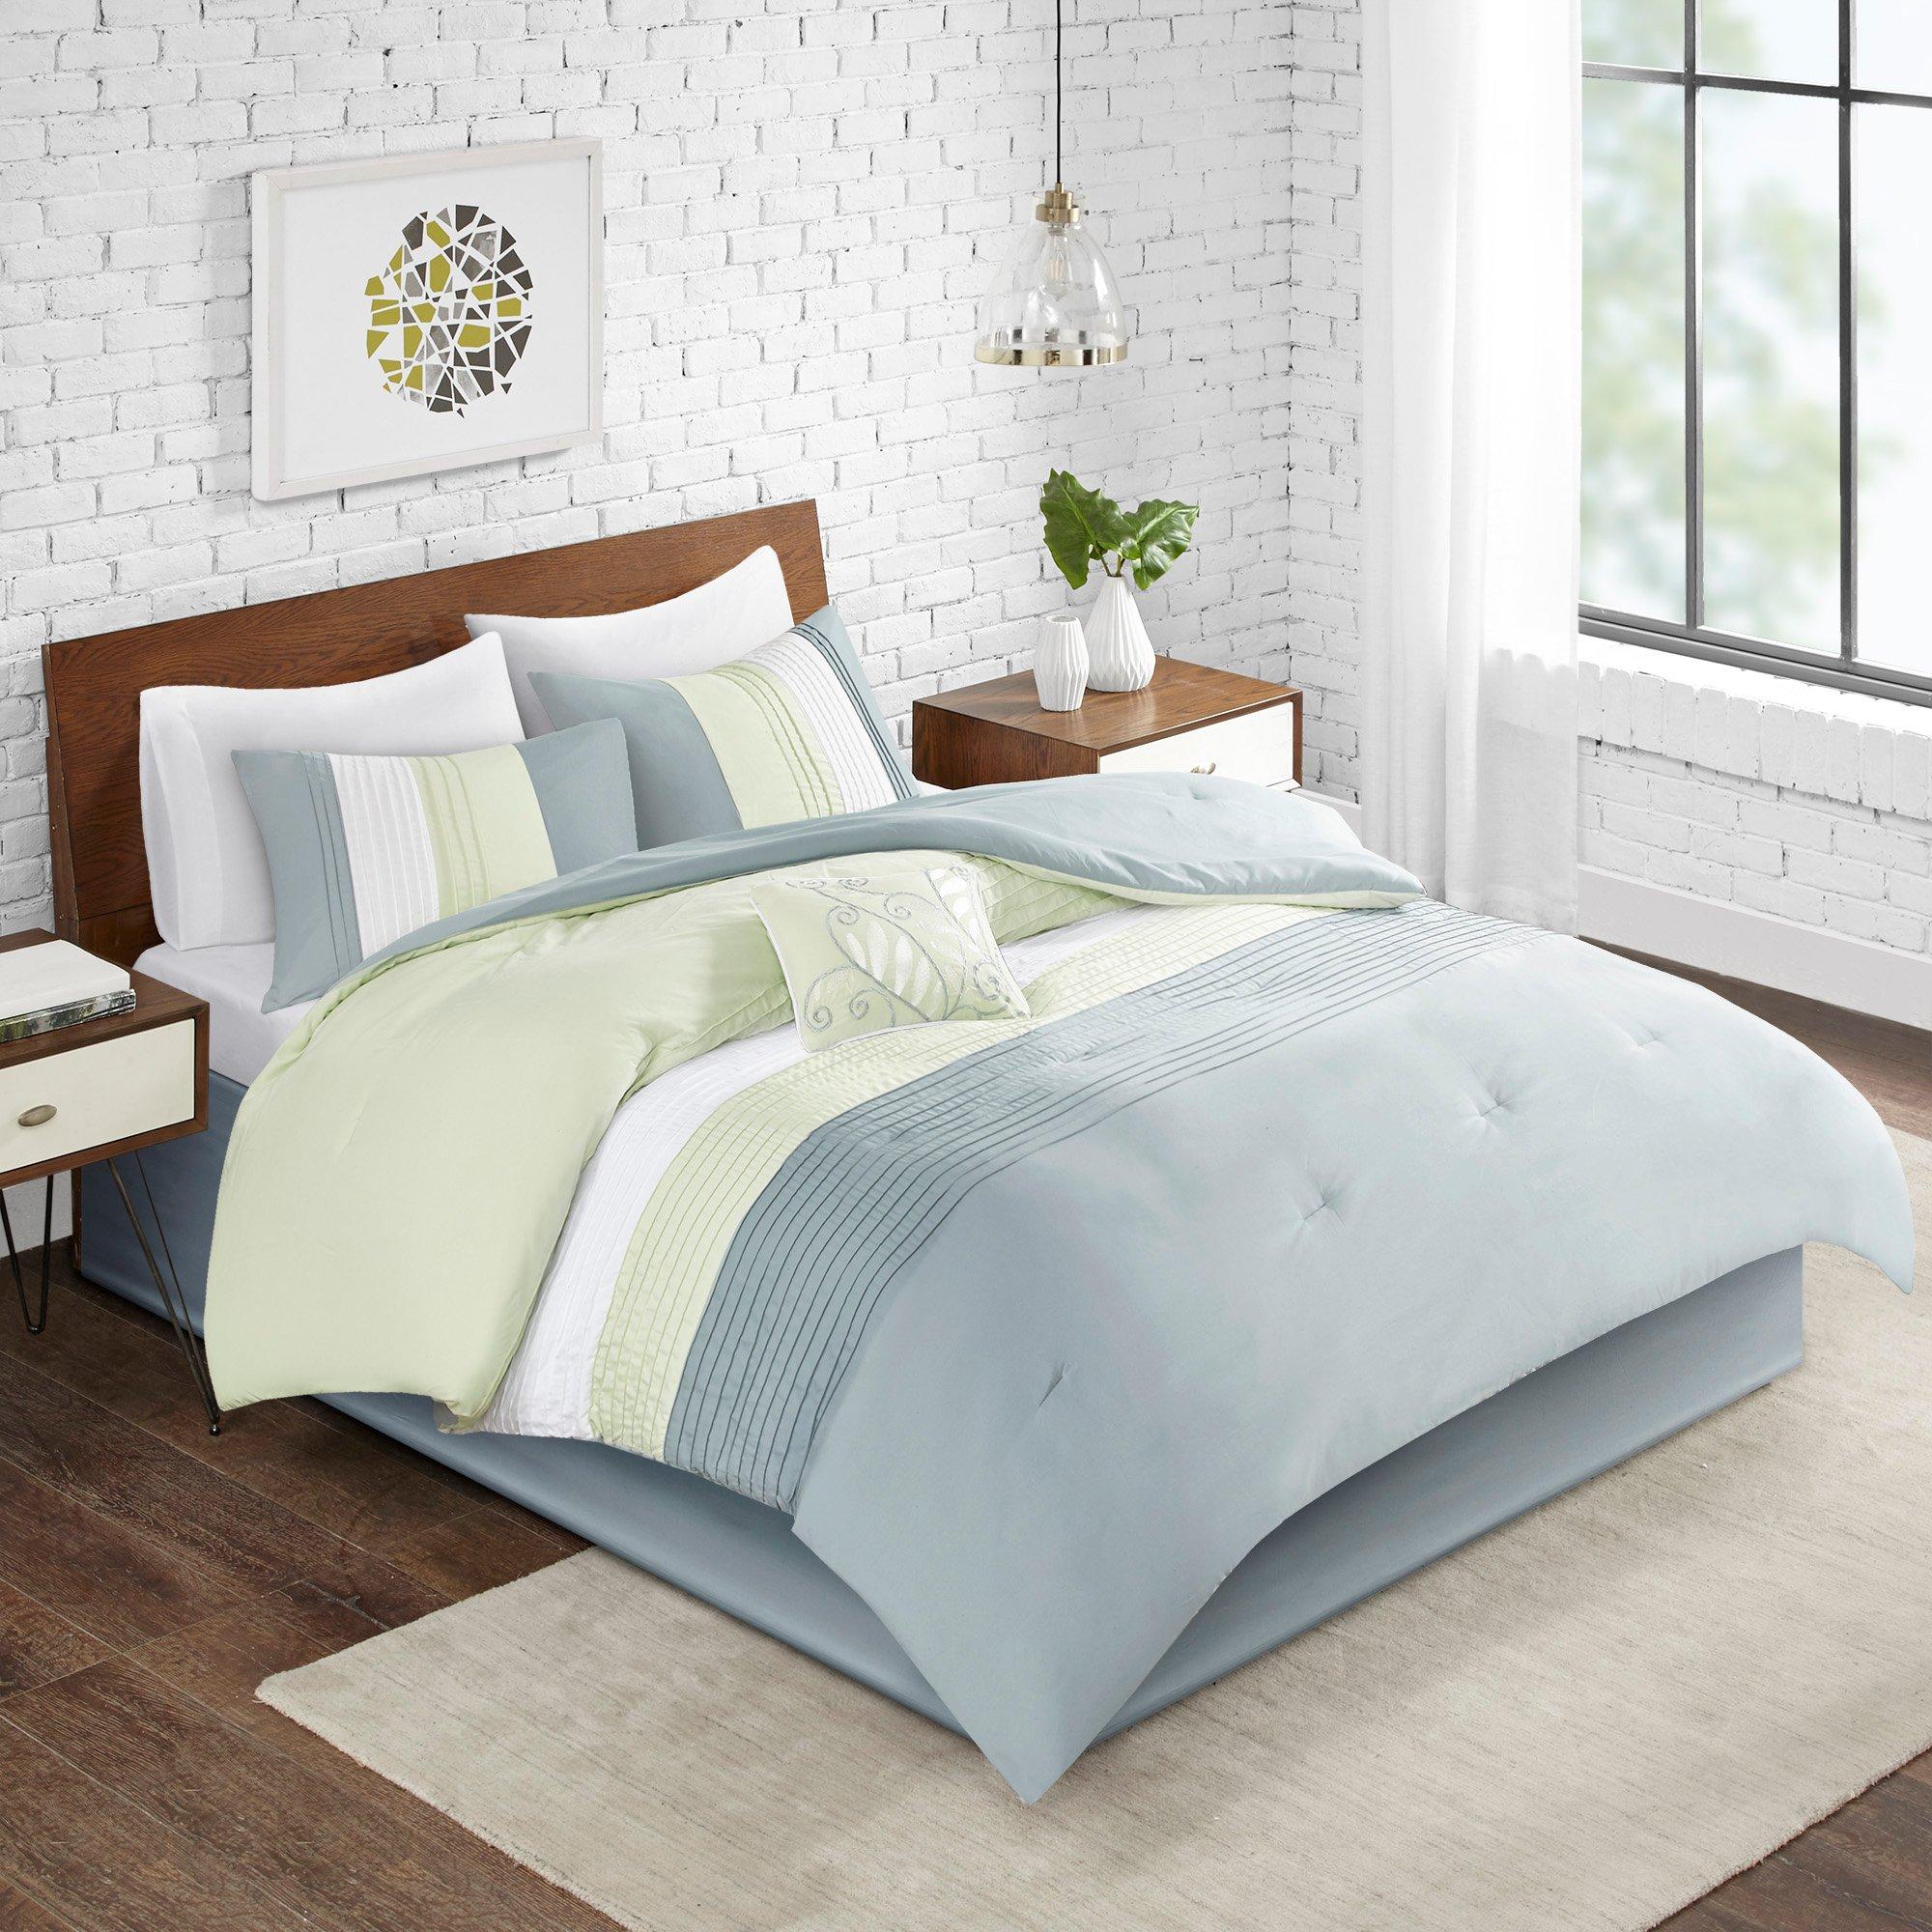 Comfort Spaces – Windsor Comforter Set- 5 Piece – Aqua, Green, Off-White – Pintuck pattern – Full/Queen size, includes 1 Comforter, 2 Shams, 1 Decorative Pillow, 1 Bed Skirt